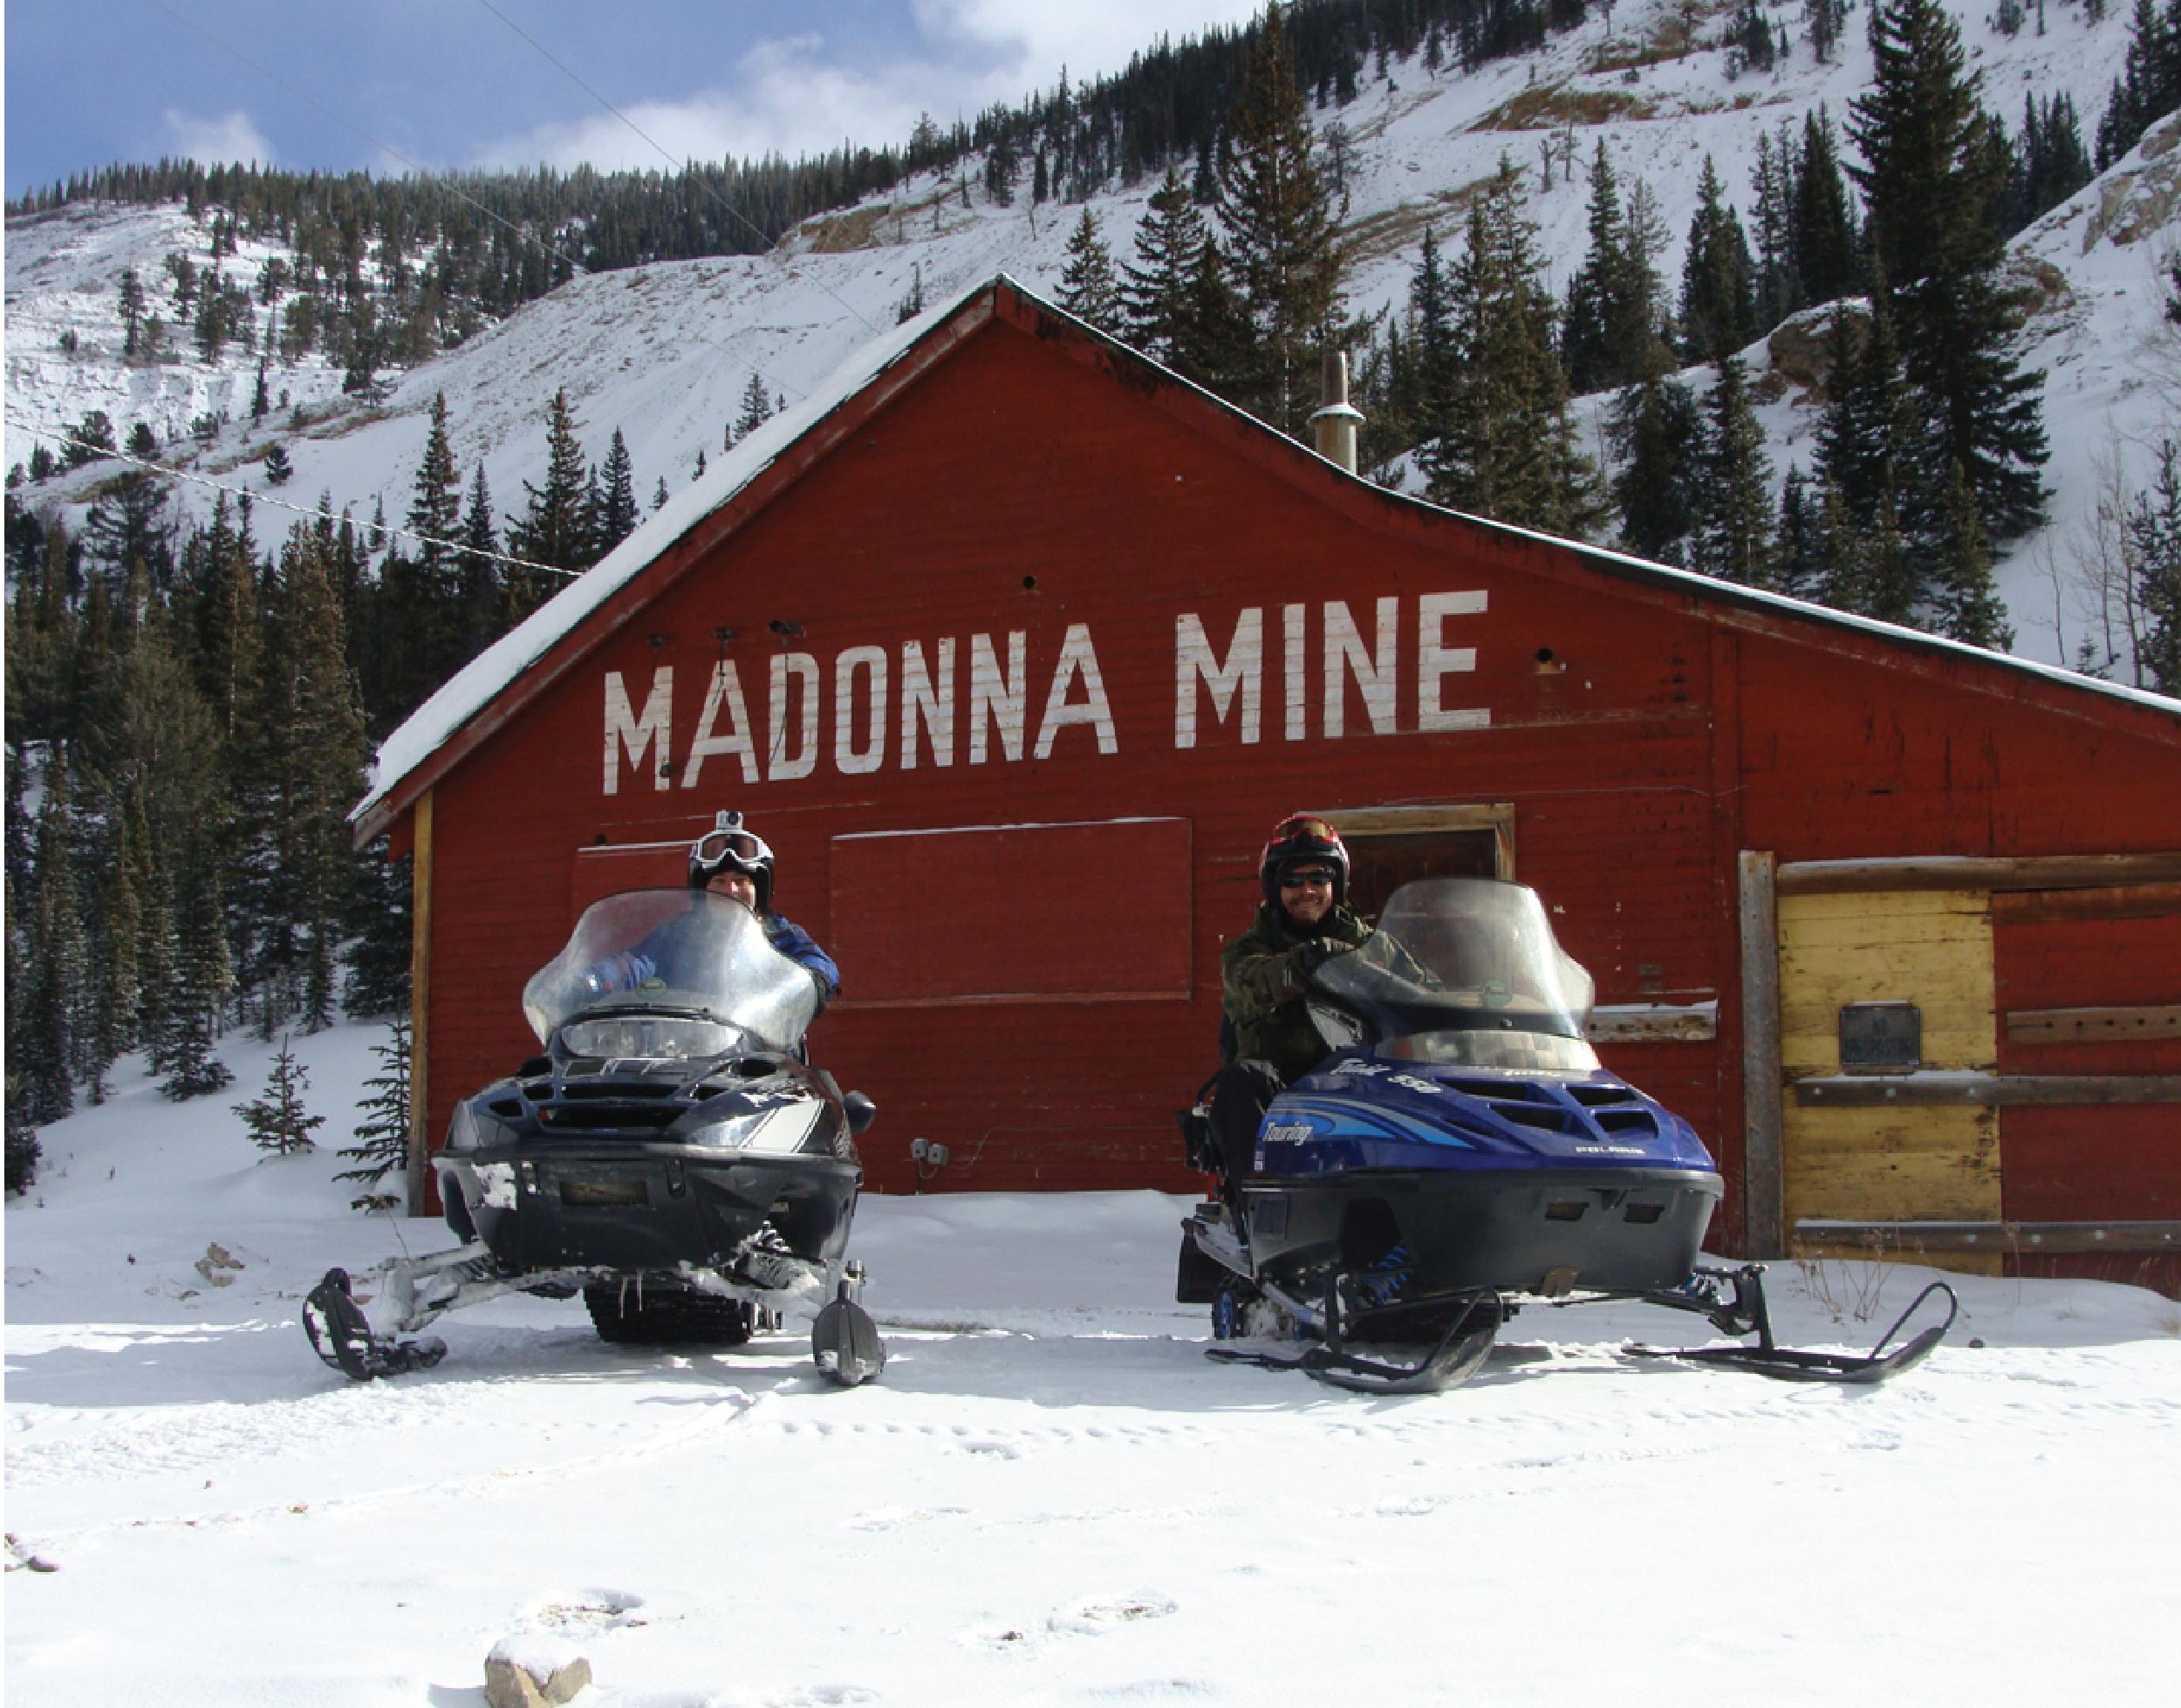 monarch snowmobile tours & rentals